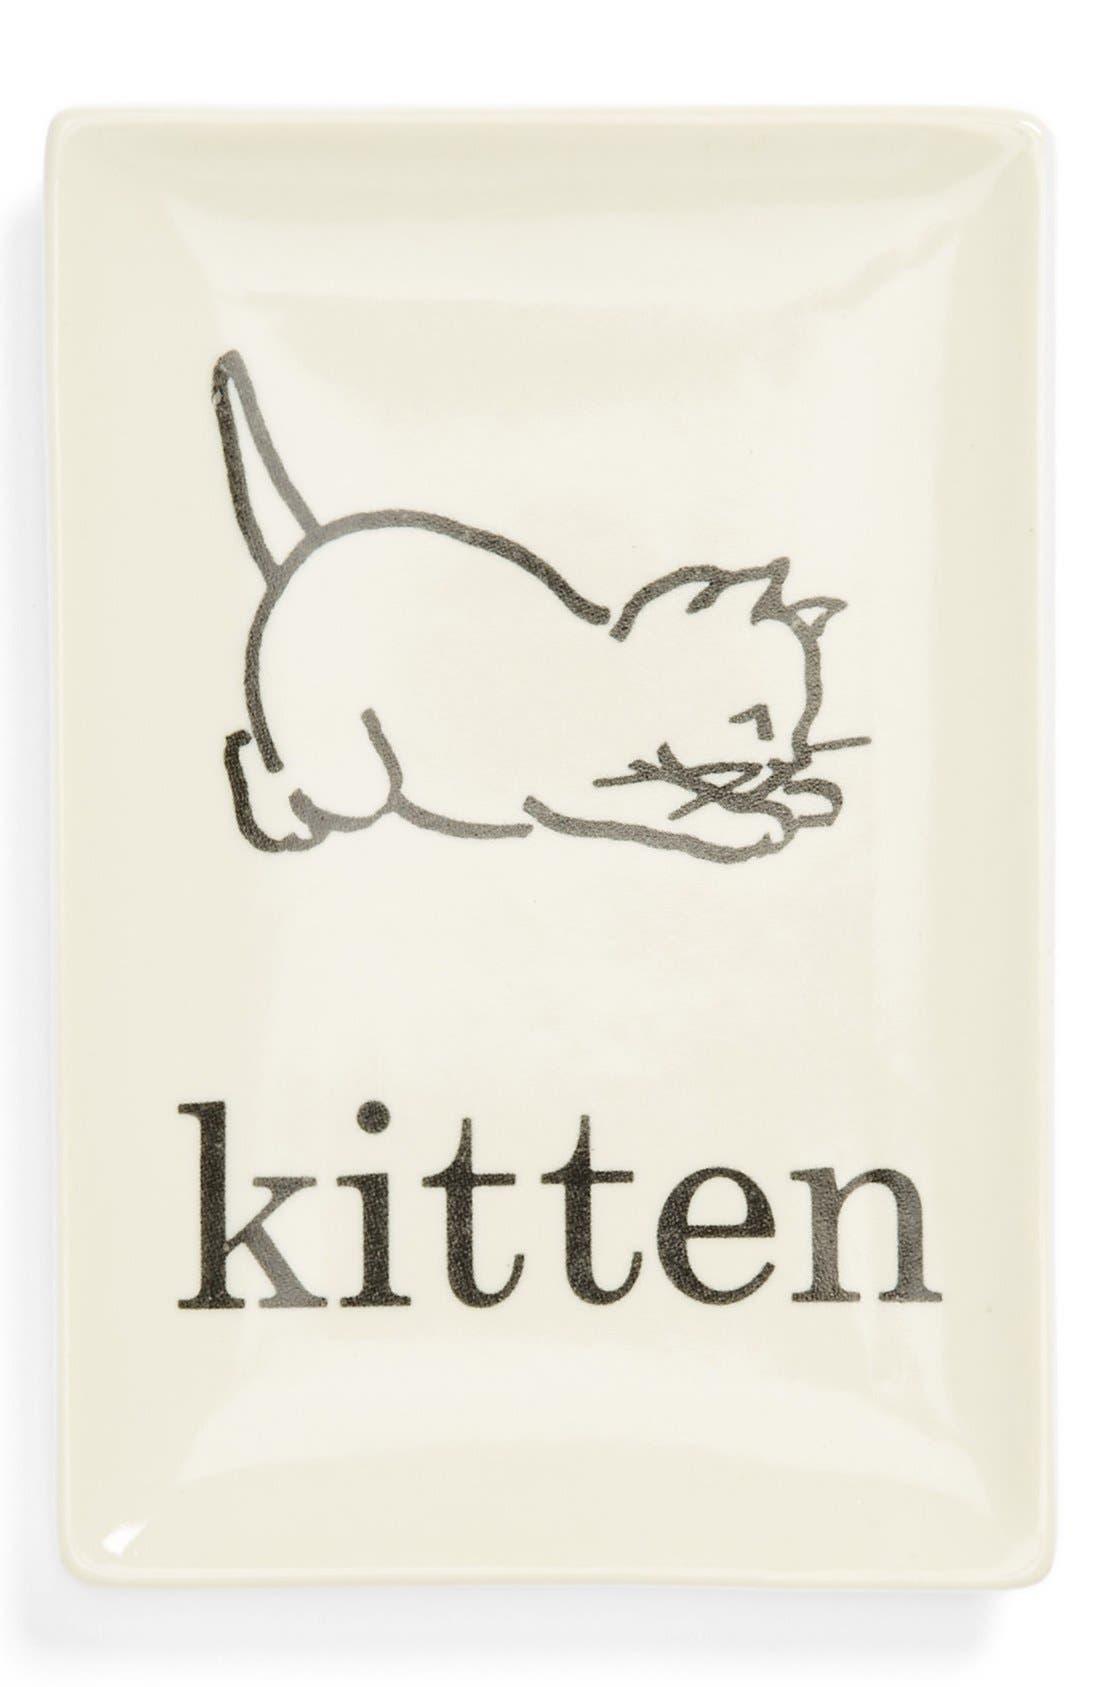 Alternate Image 1 Selected - Rosanna 'Flash Cards - Kitten' Porcelain Tray